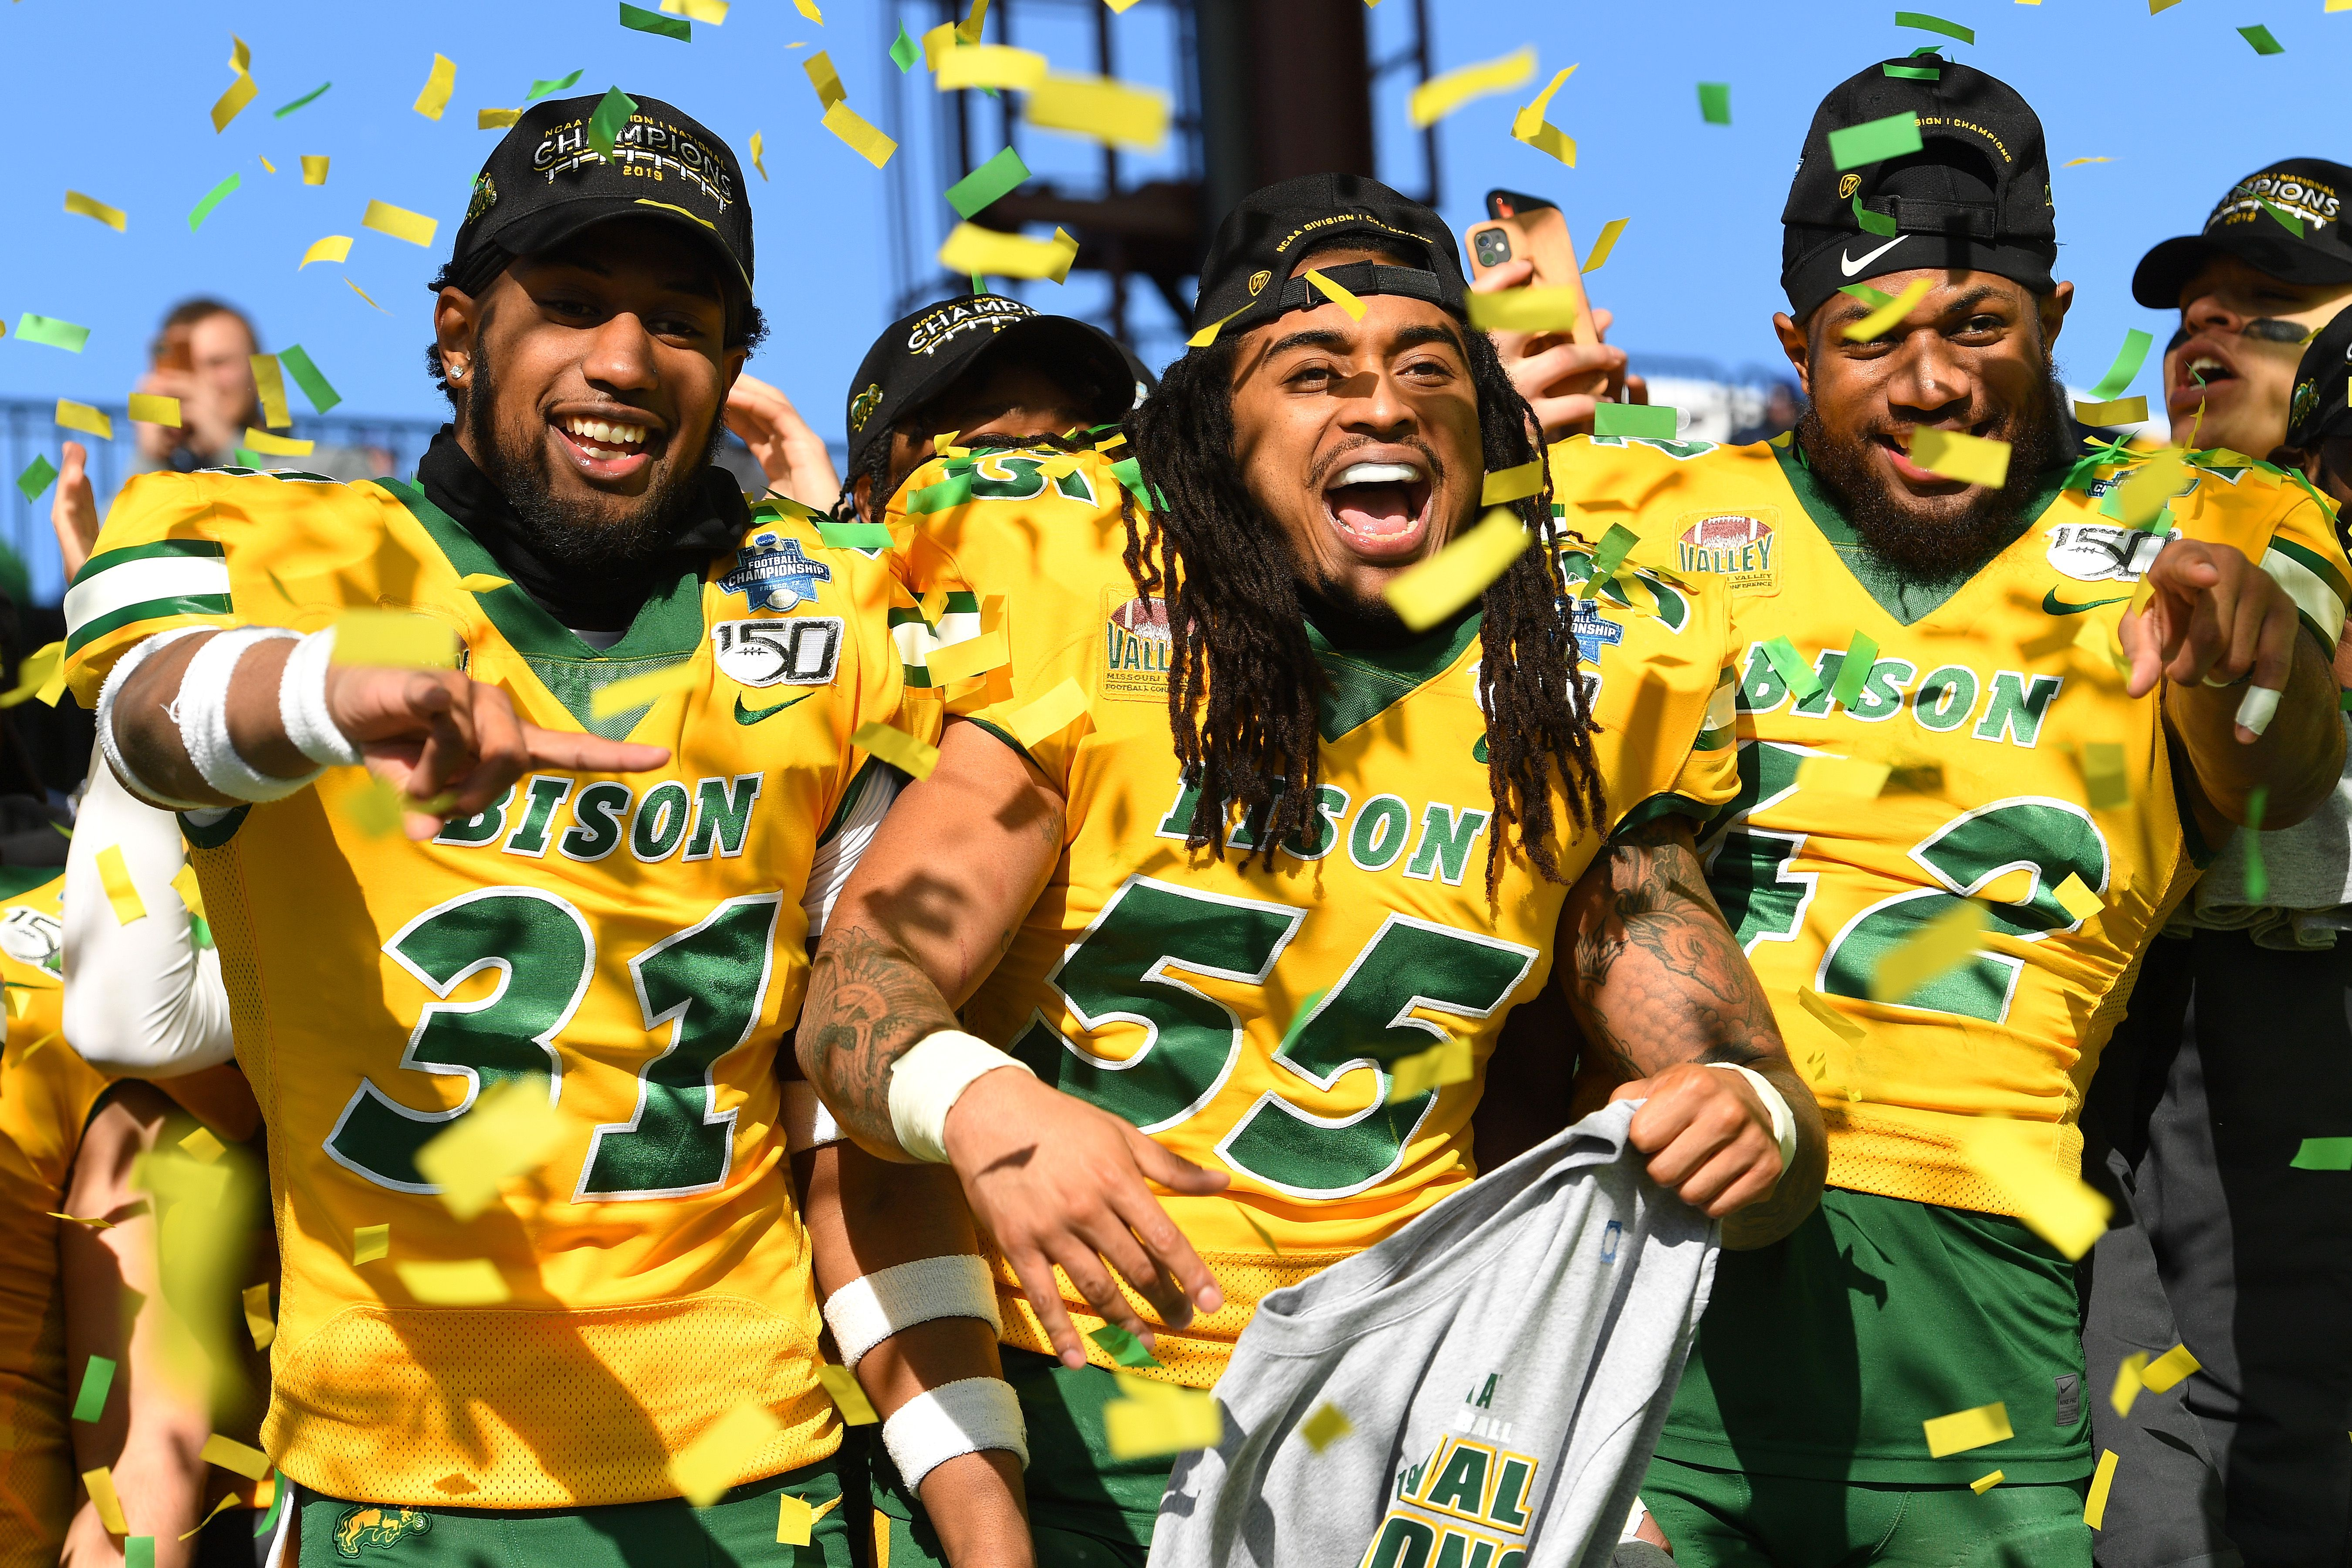 North Dakota State team celebrating